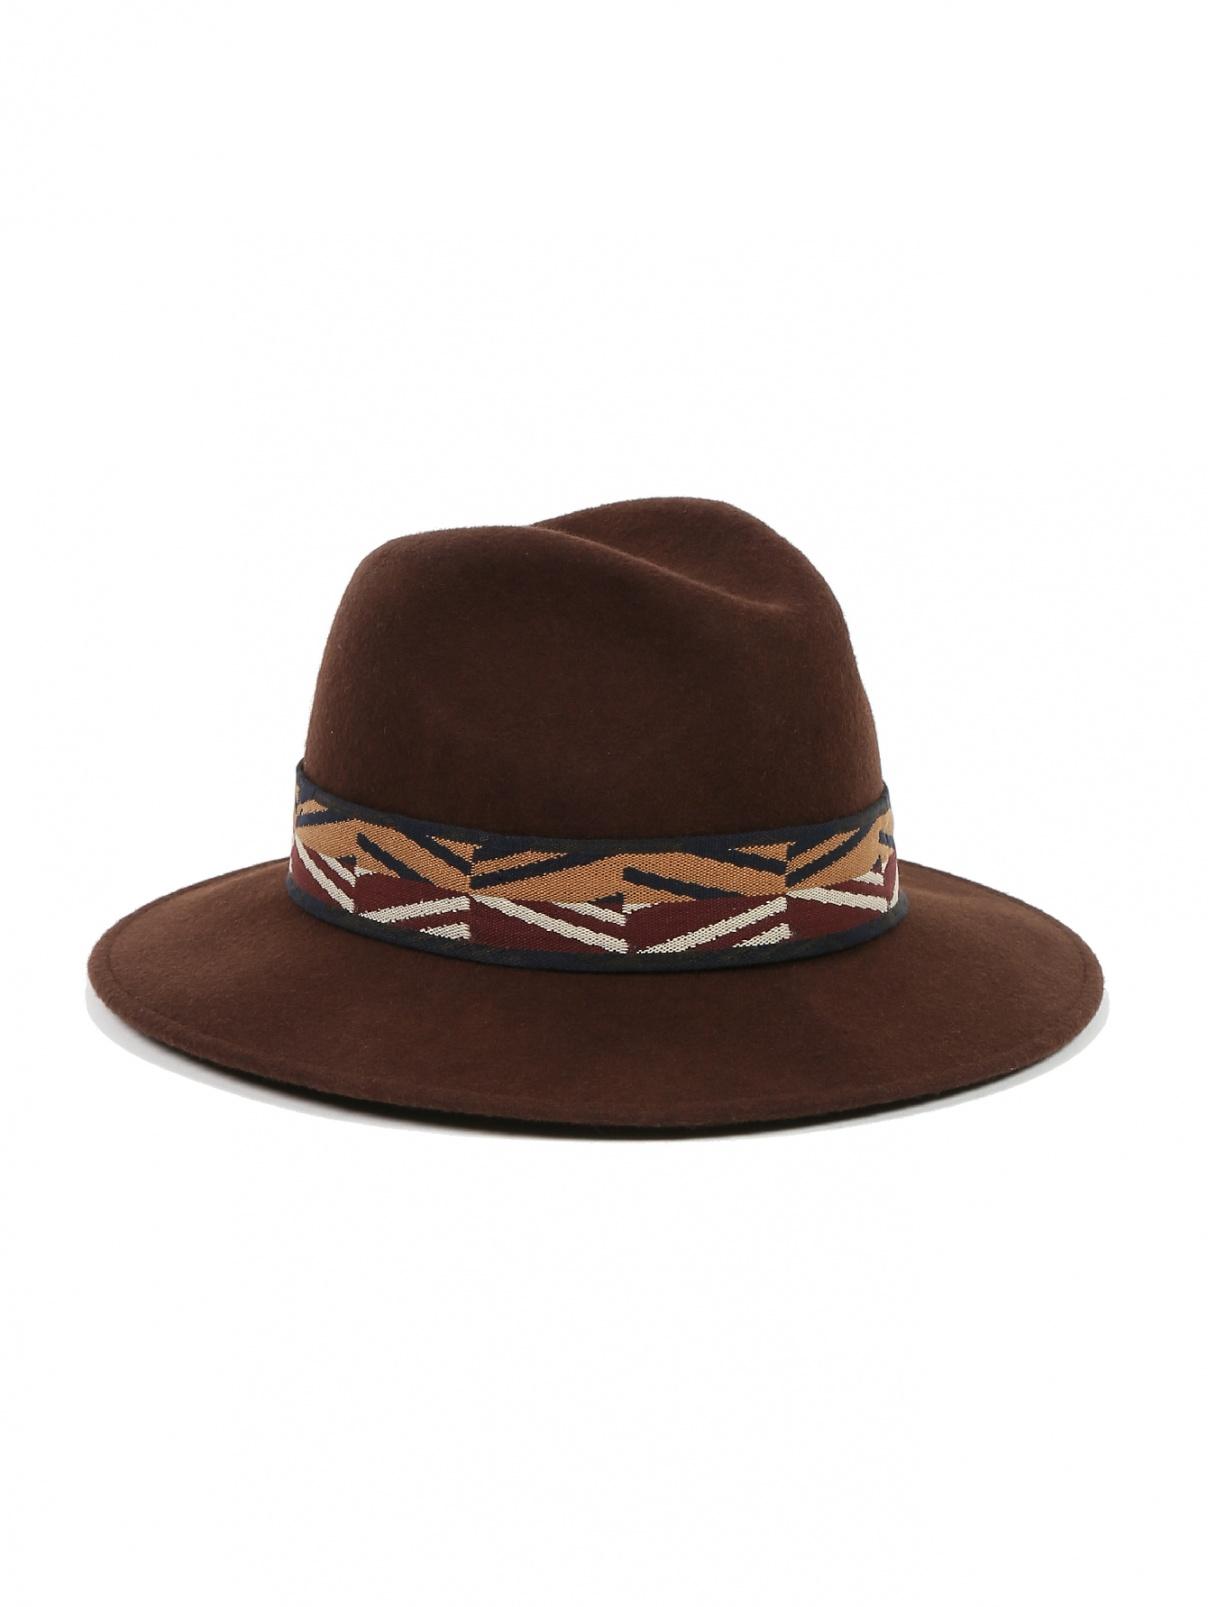 Шляпа из шерсти с узором Weekend Max Mara  –  Общий вид